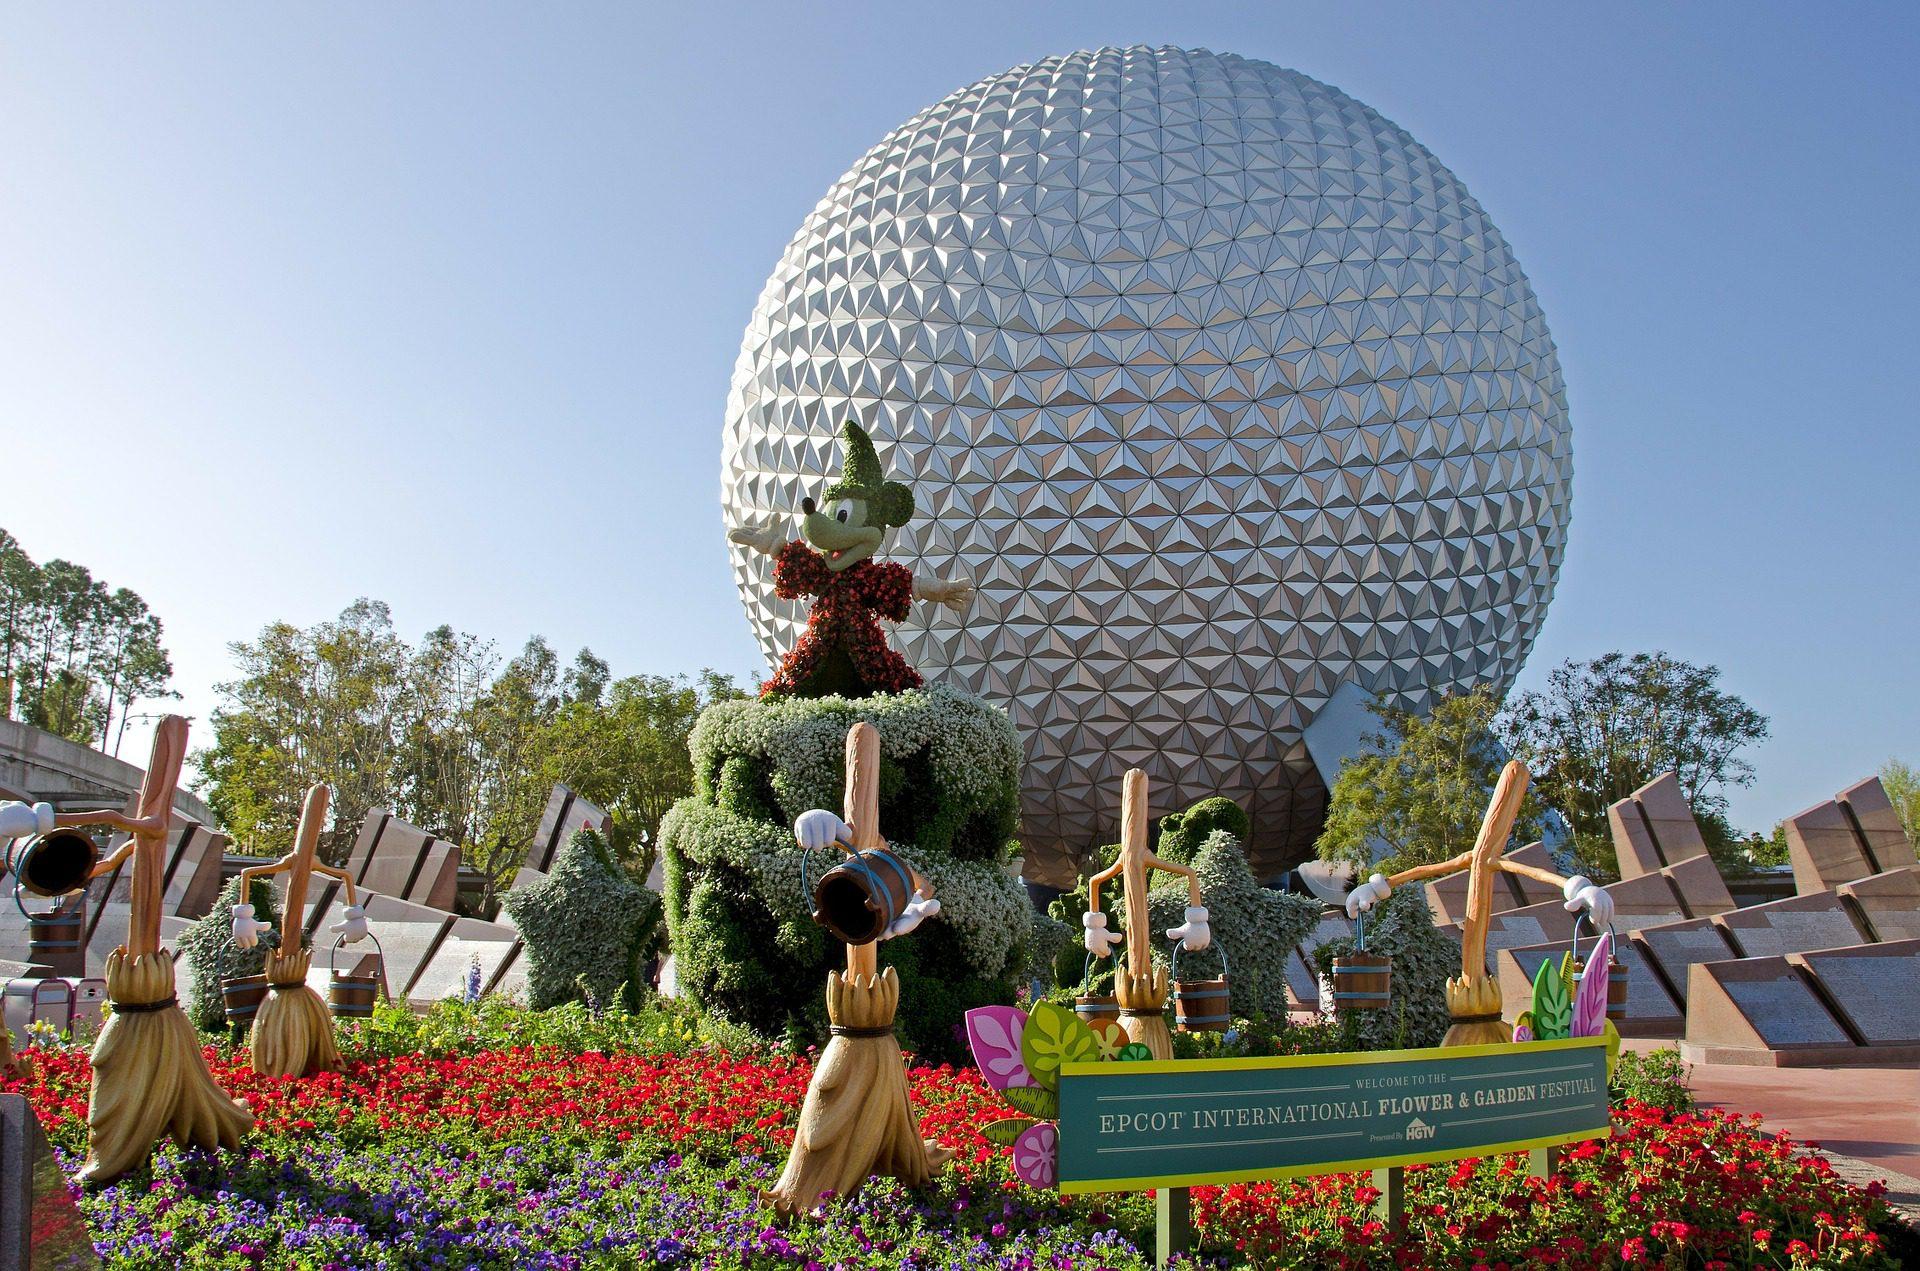 Epcot - Walt Disney World, Orlando, FL